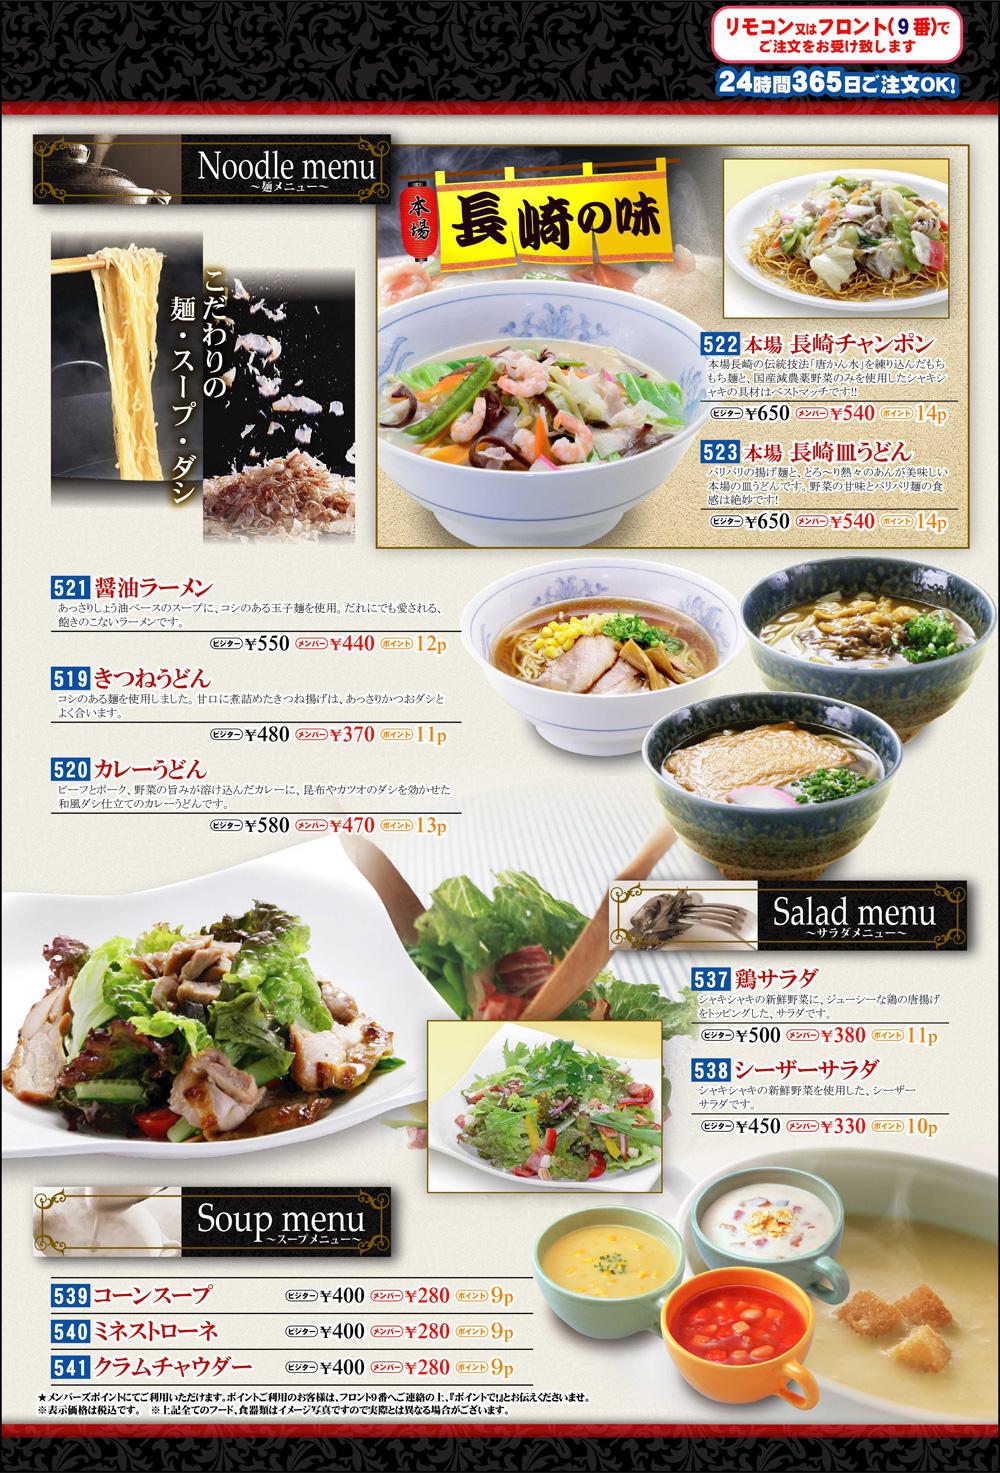 Noodle Menu ~麺メニュー~・Salad Menu ~サラダメニュー~・Soup Menu ~スープメニュー~